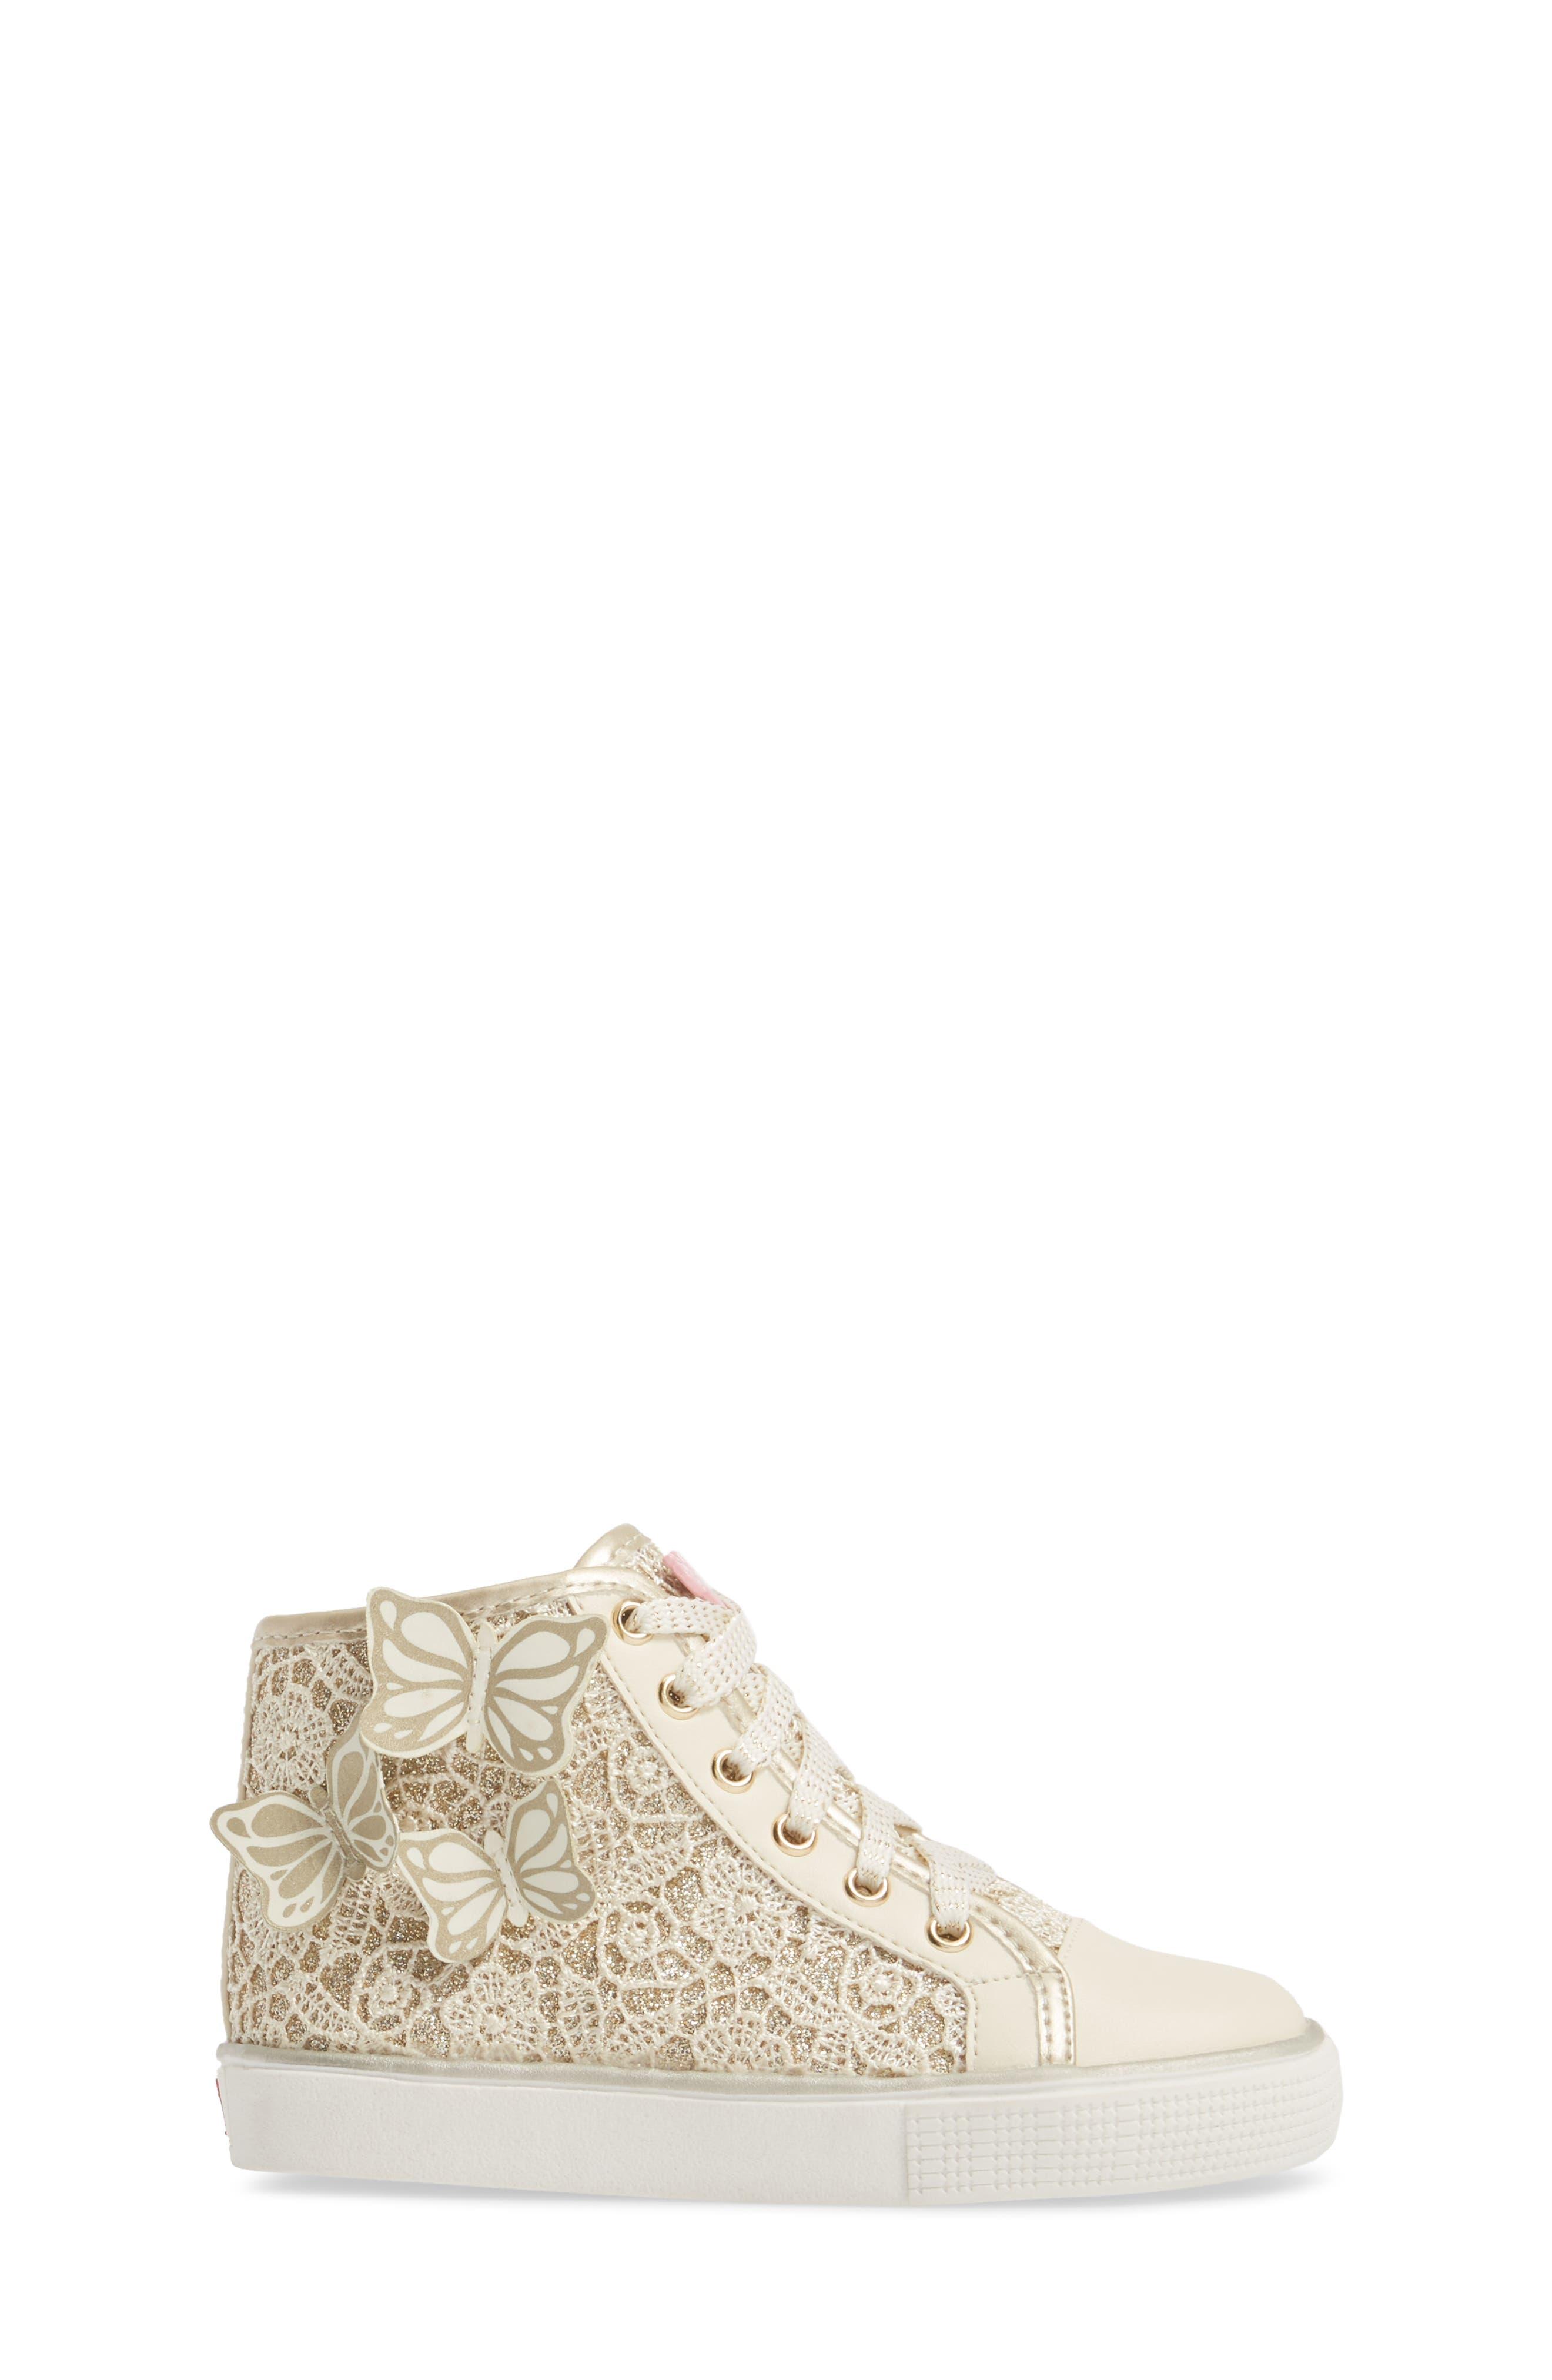 Ashlyn Glitter High Top Sneaker,                             Alternate thumbnail 3, color,                             710